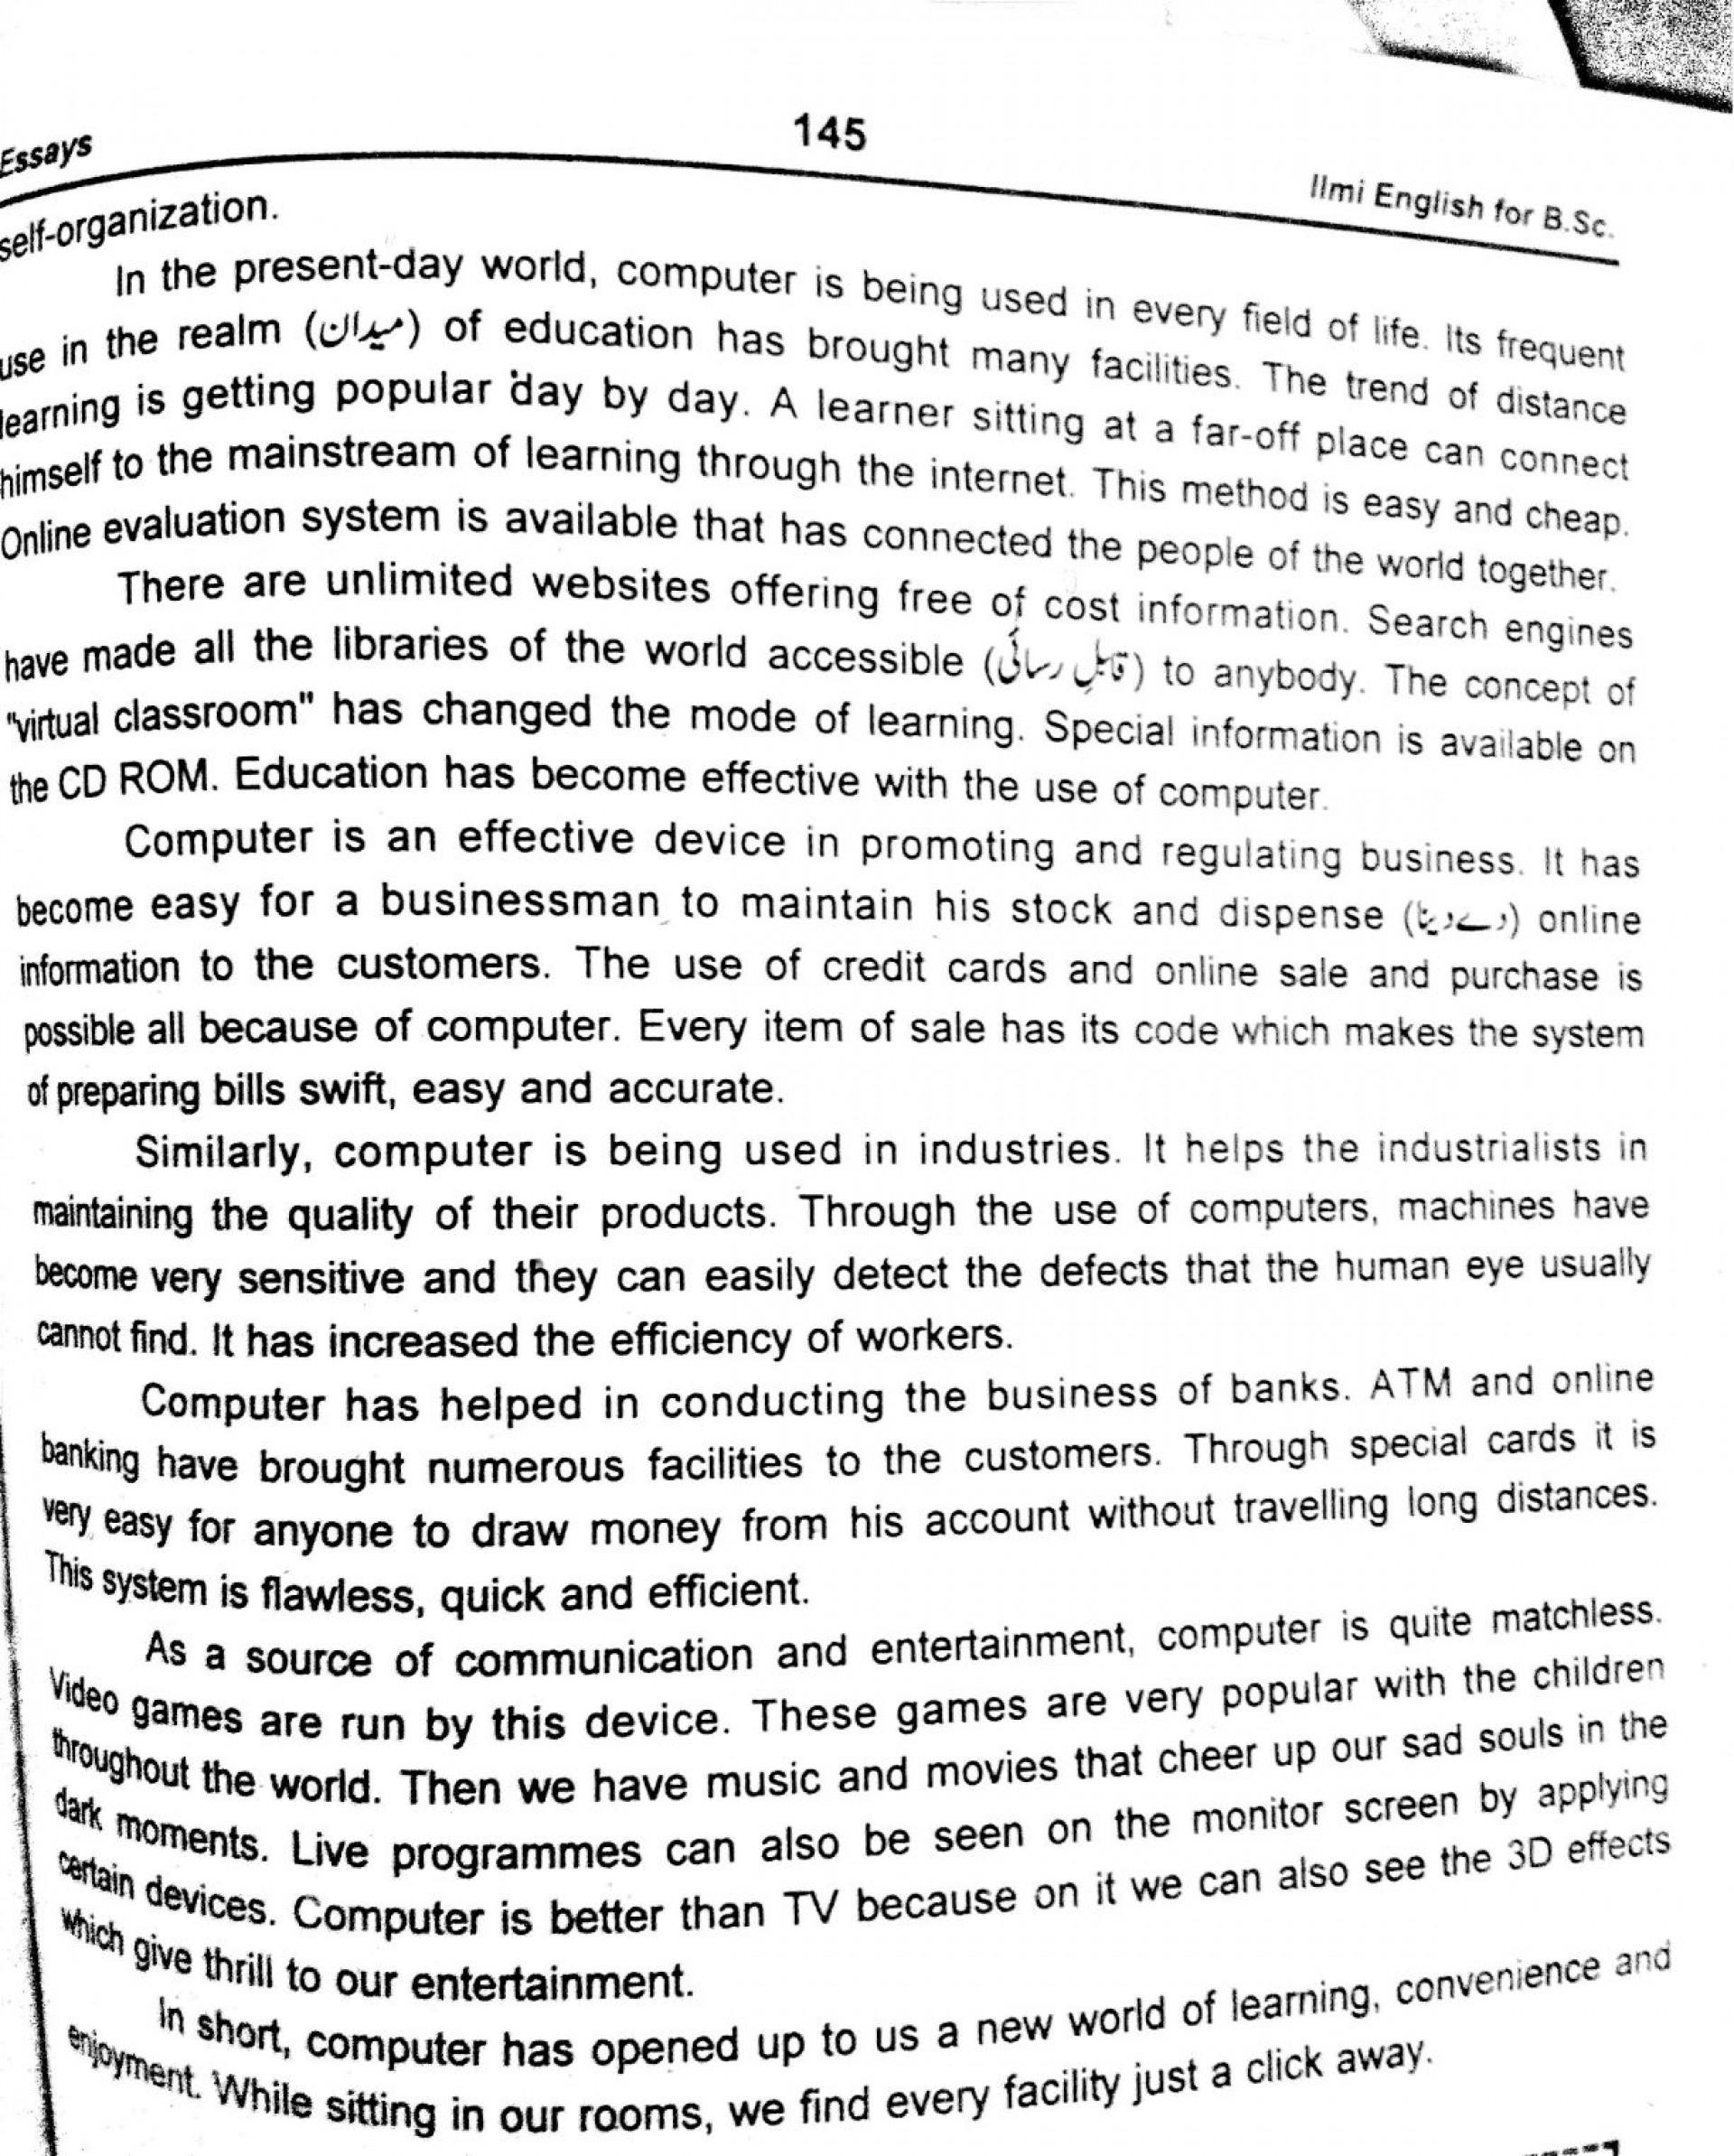 007 Past Papers Islamia University Bsc Part English Compulsory Essay